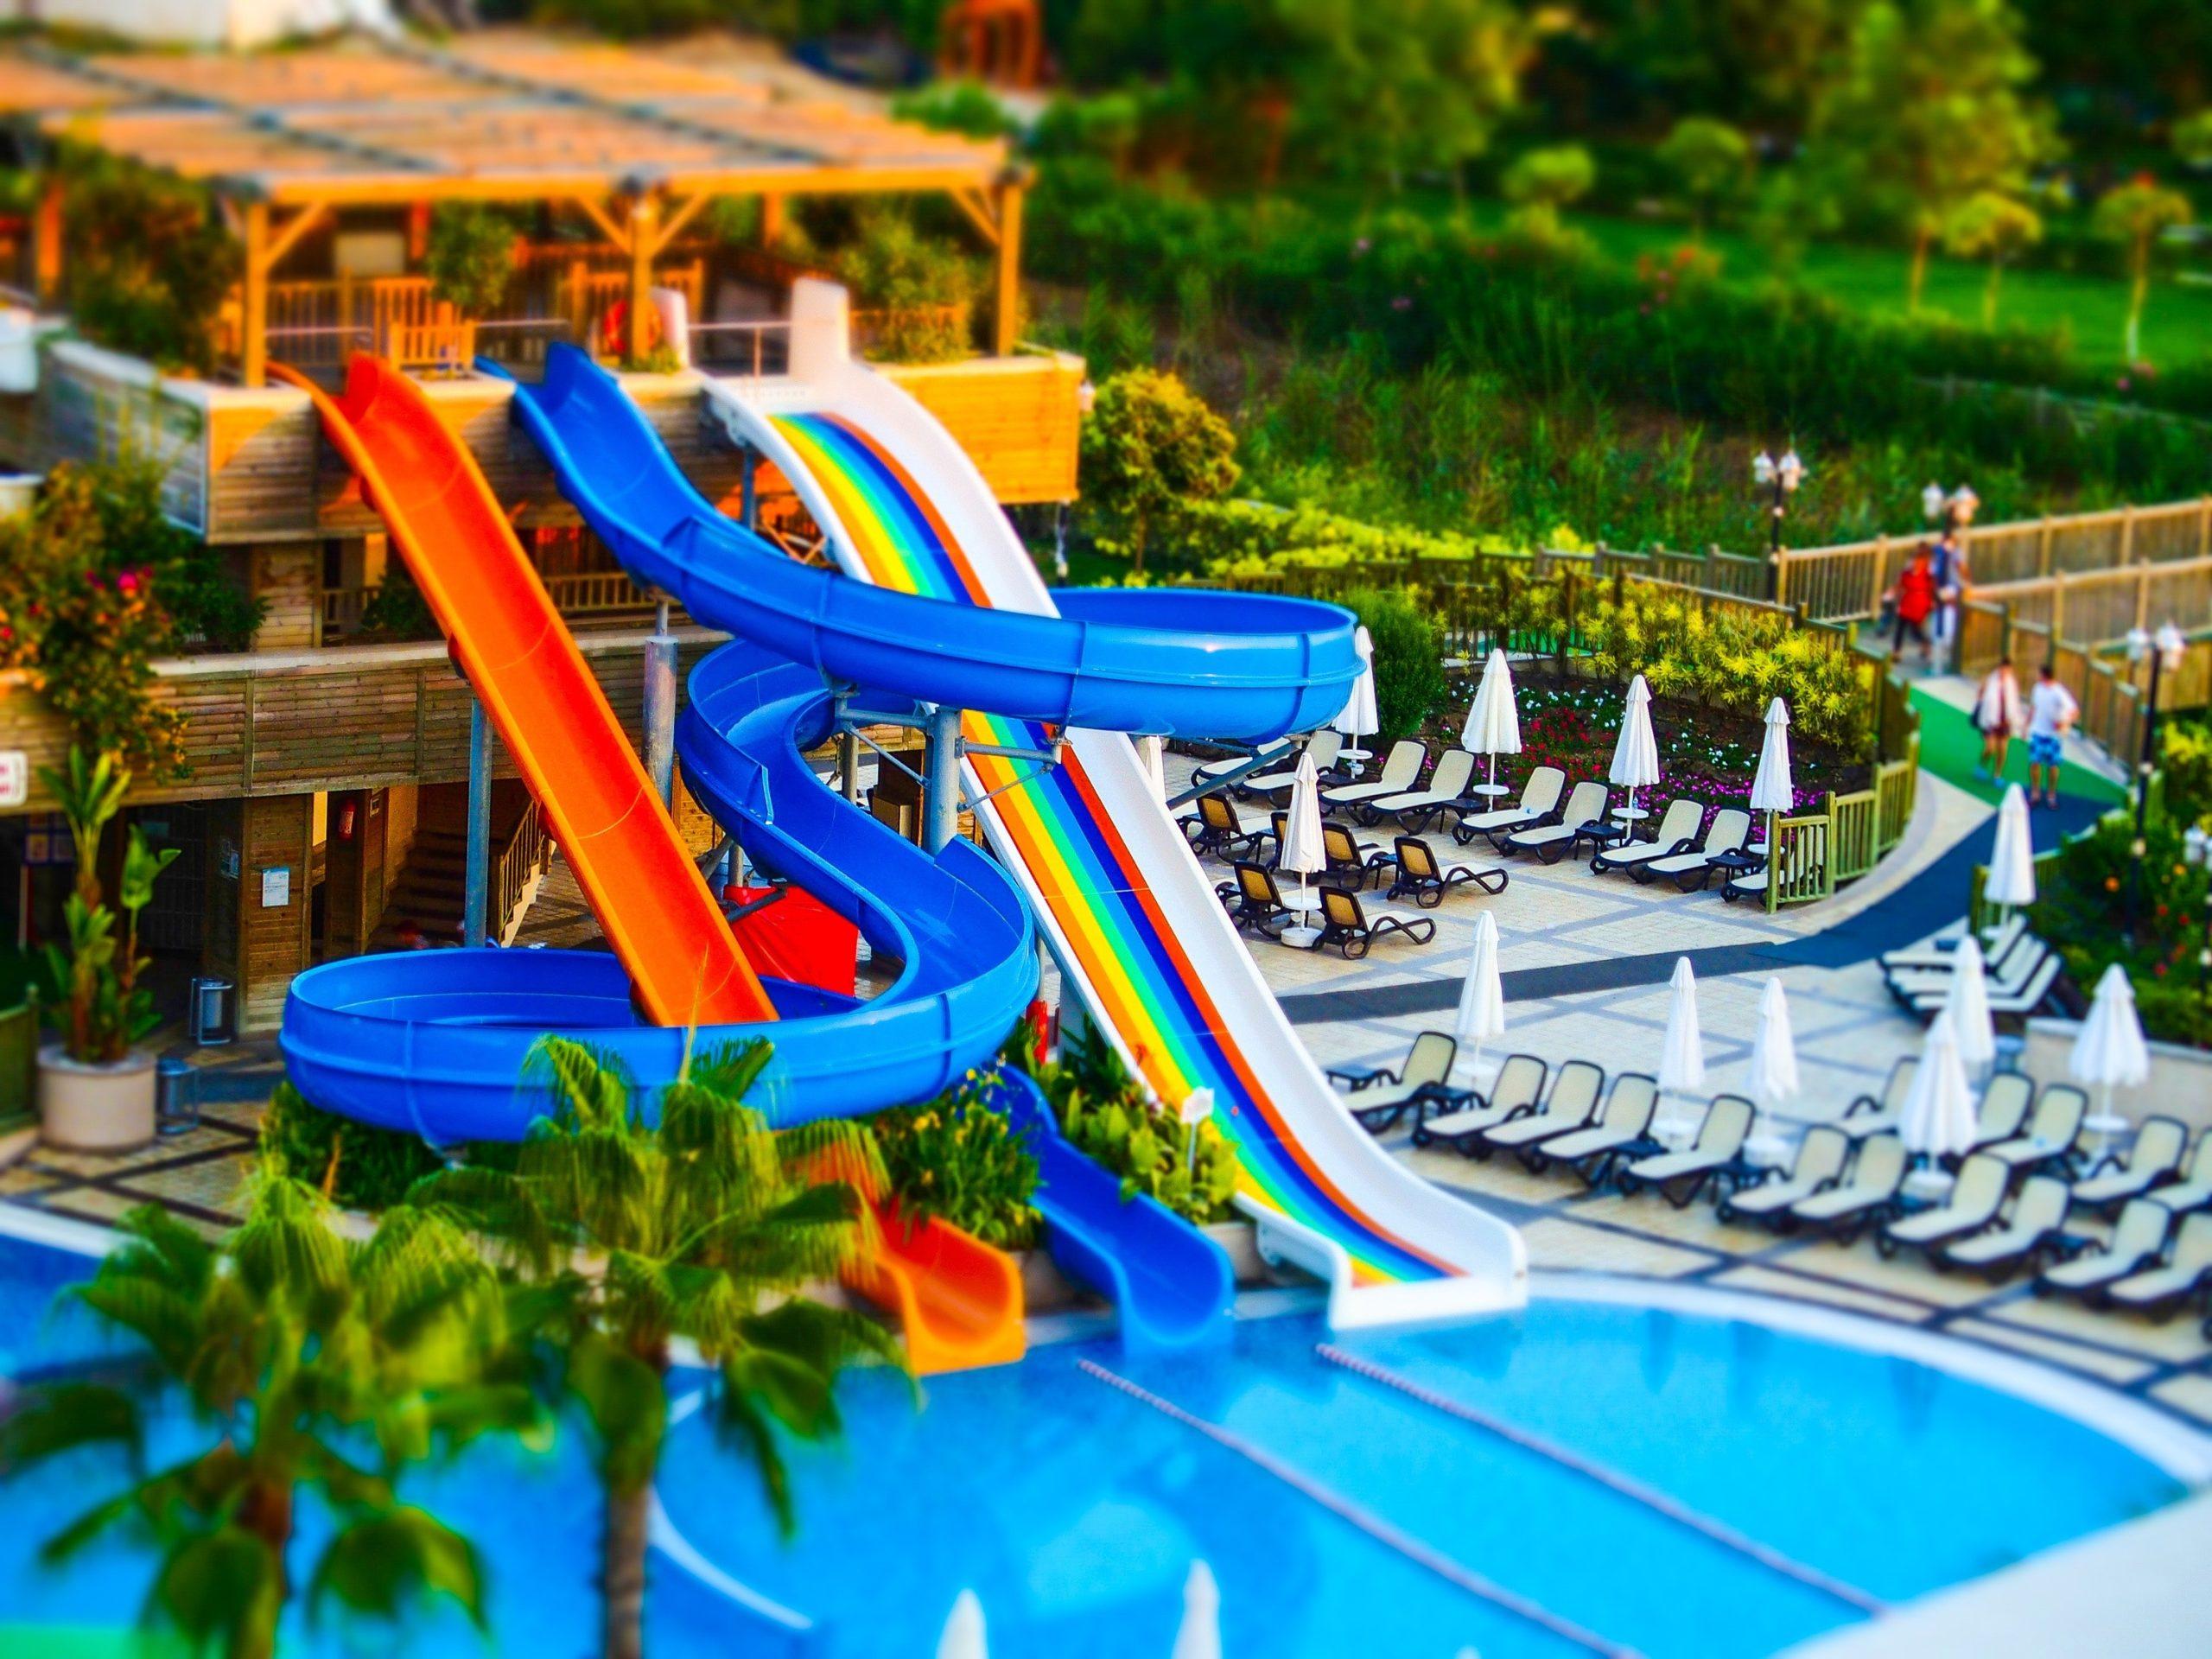 Best Swimming Pool Slides To Buy